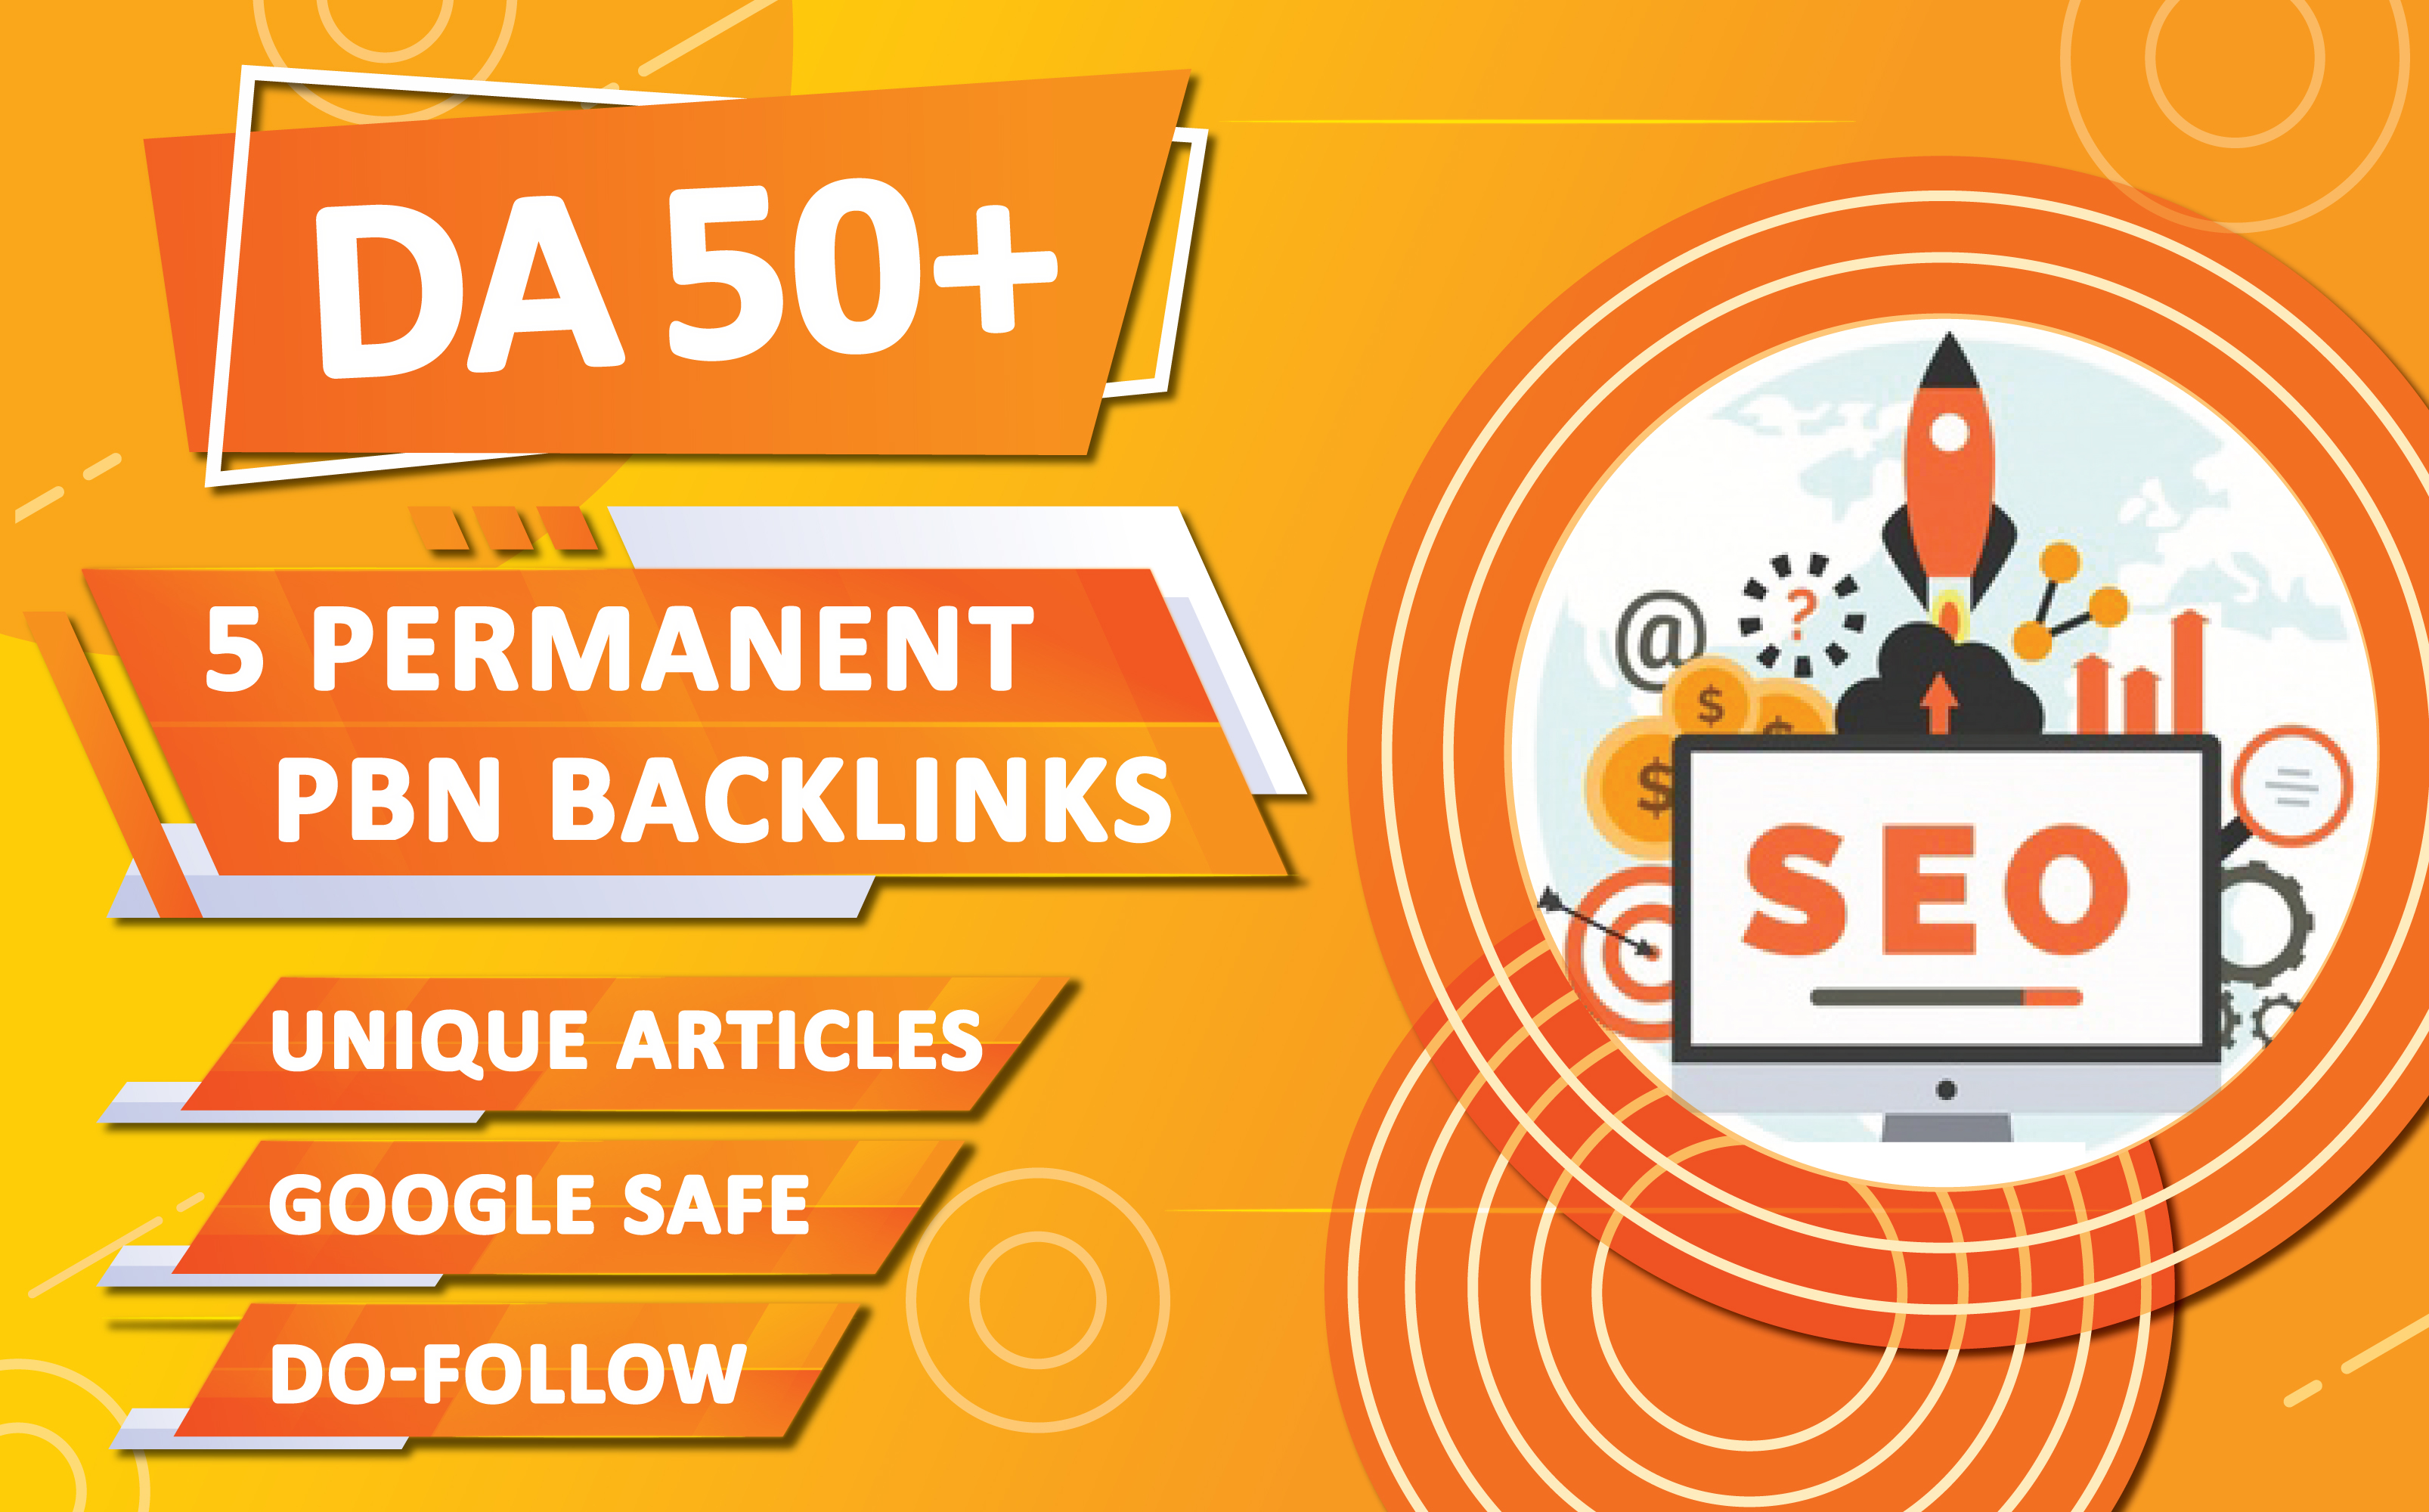 5 Permanent PBN backlinks DA 50+